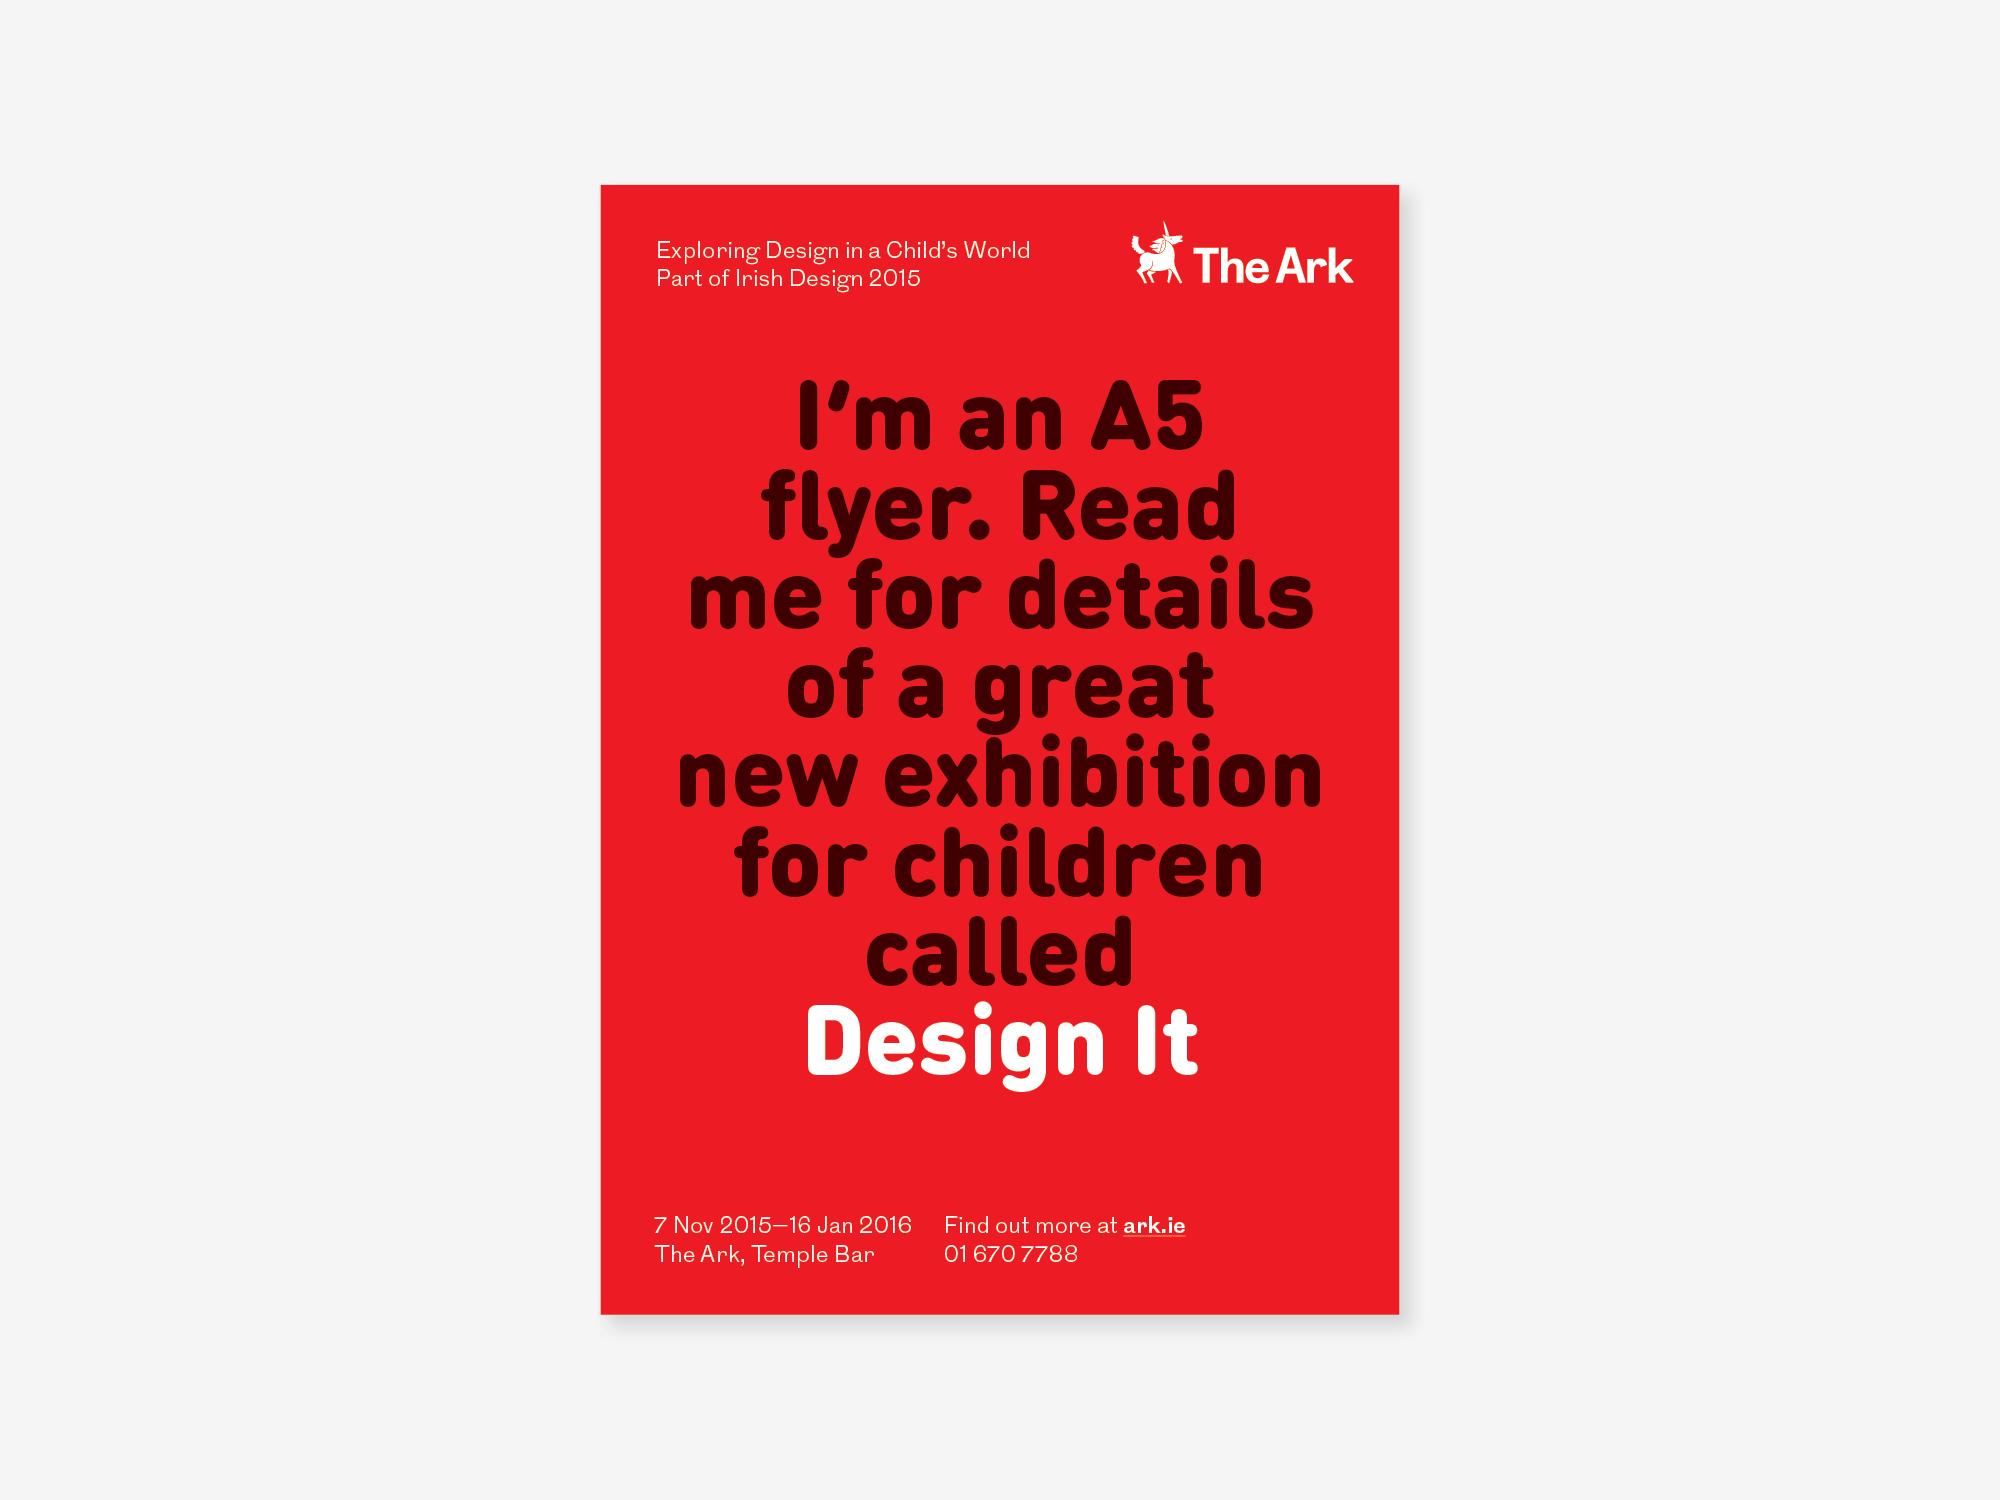 Cover image: Ark Design It